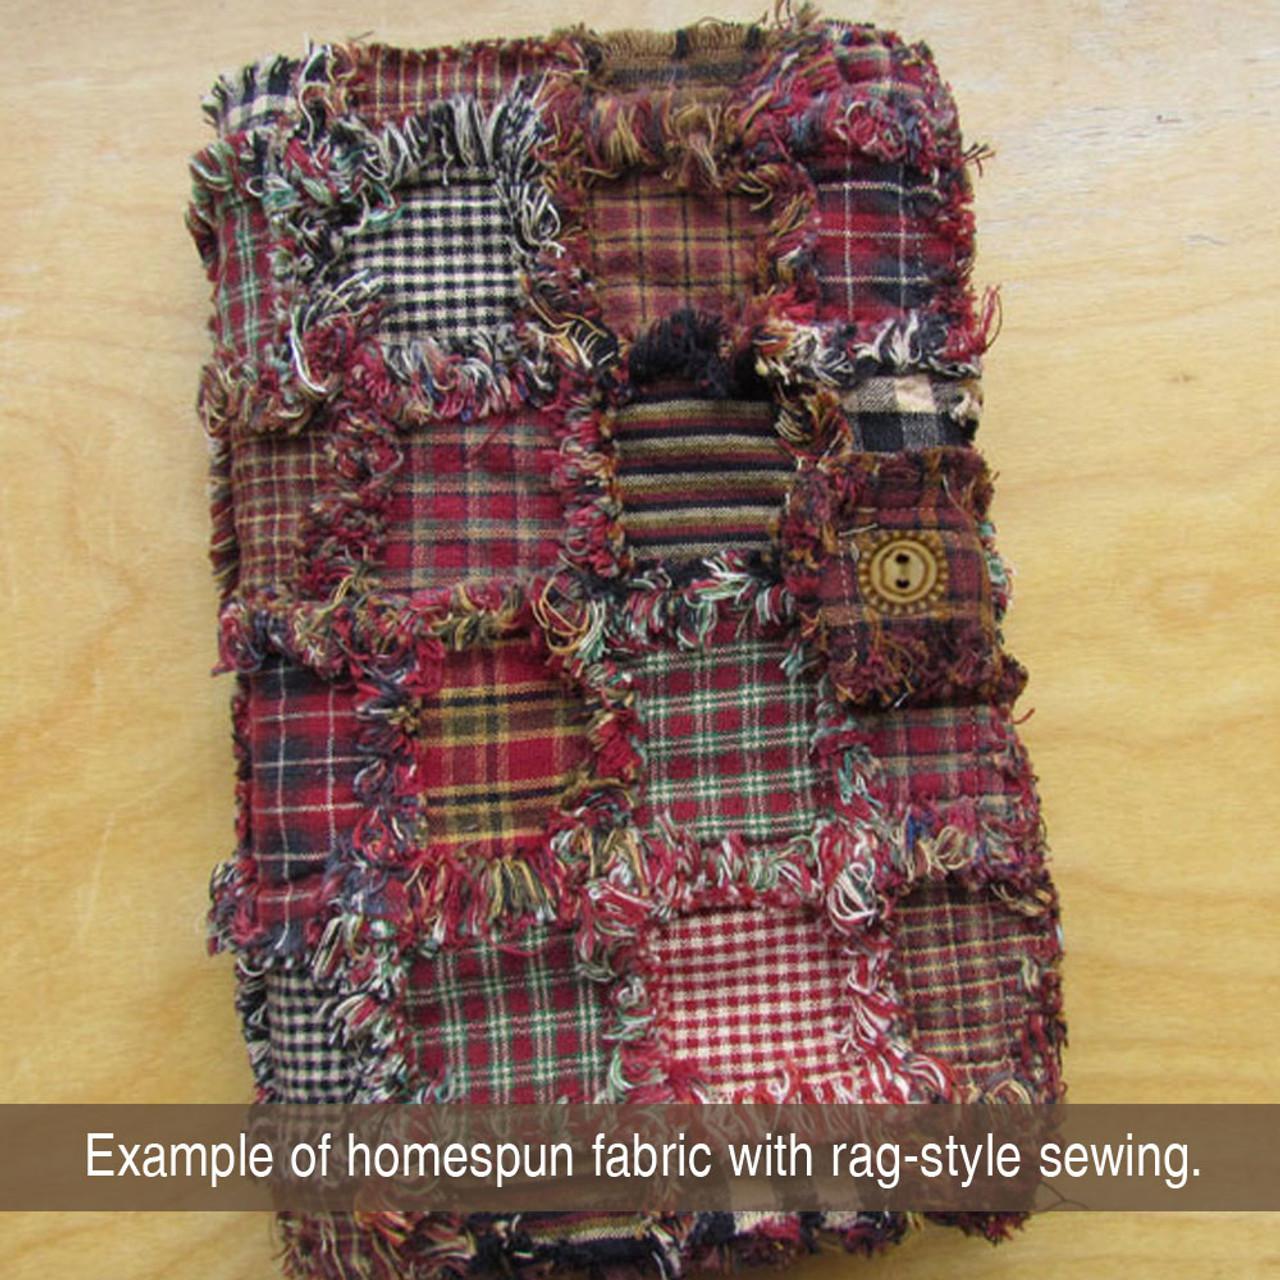 Cabin Red Homespun Cotton Fabric